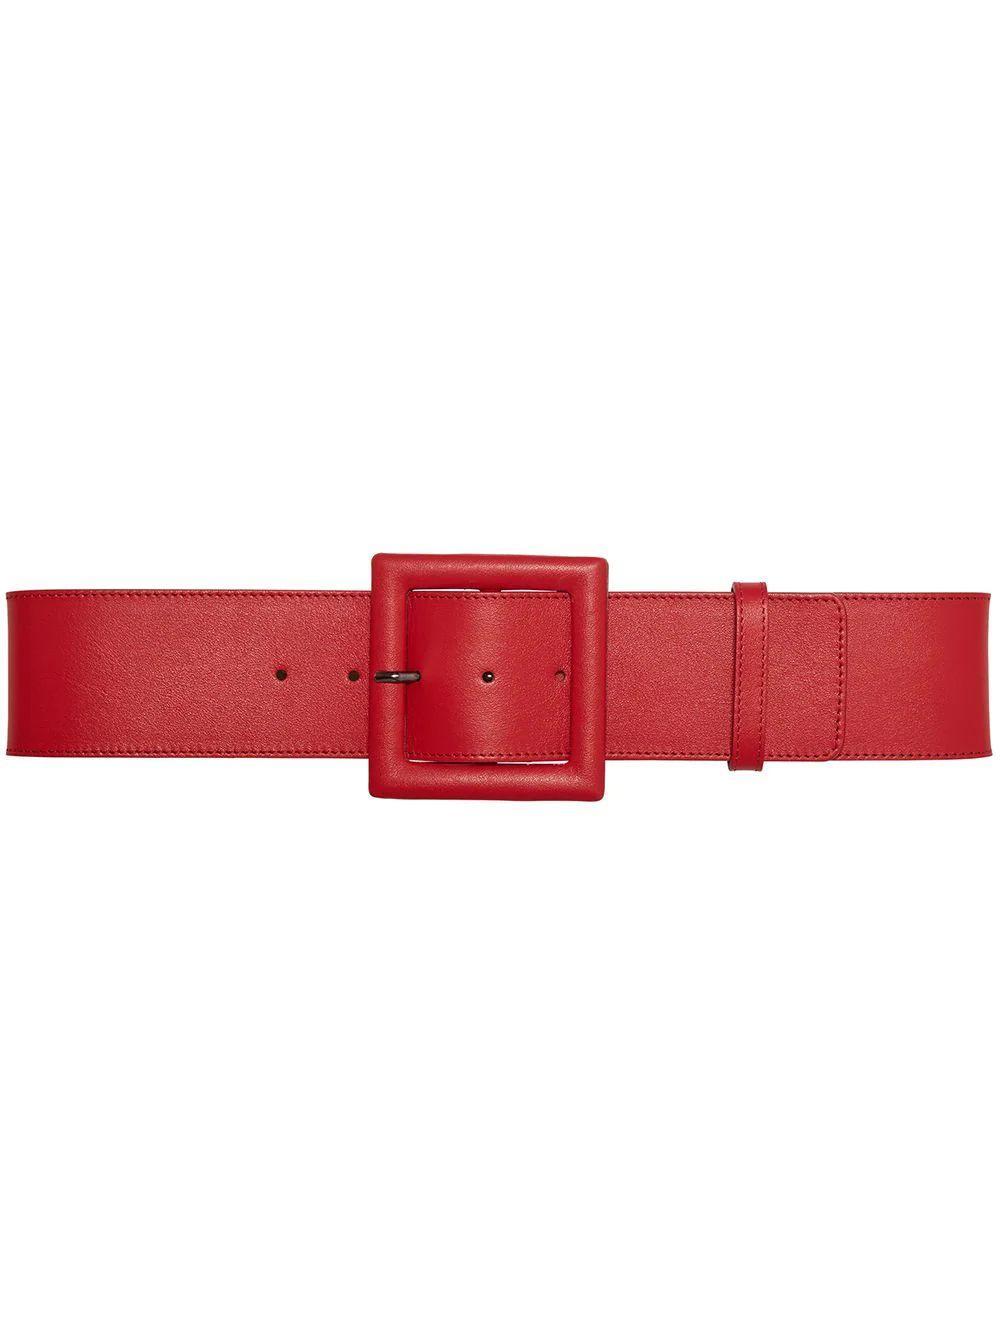 Square Buckle Belt Item # P2134N101LEA